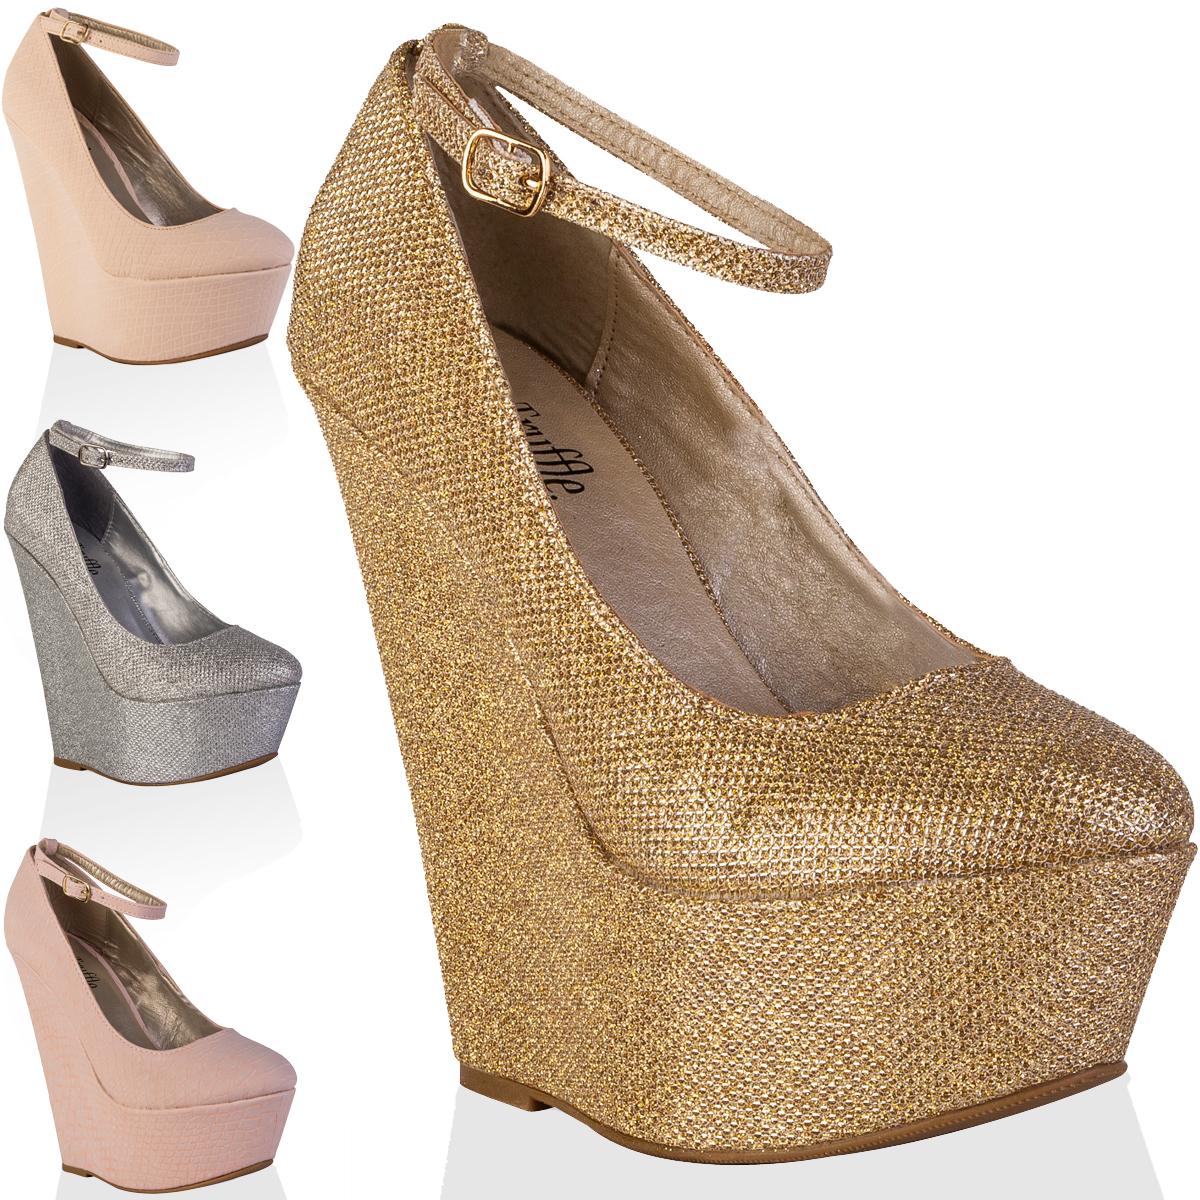 88g womens platform ladies high heels party summer wedges court shoes size 3 8 ebay. Black Bedroom Furniture Sets. Home Design Ideas